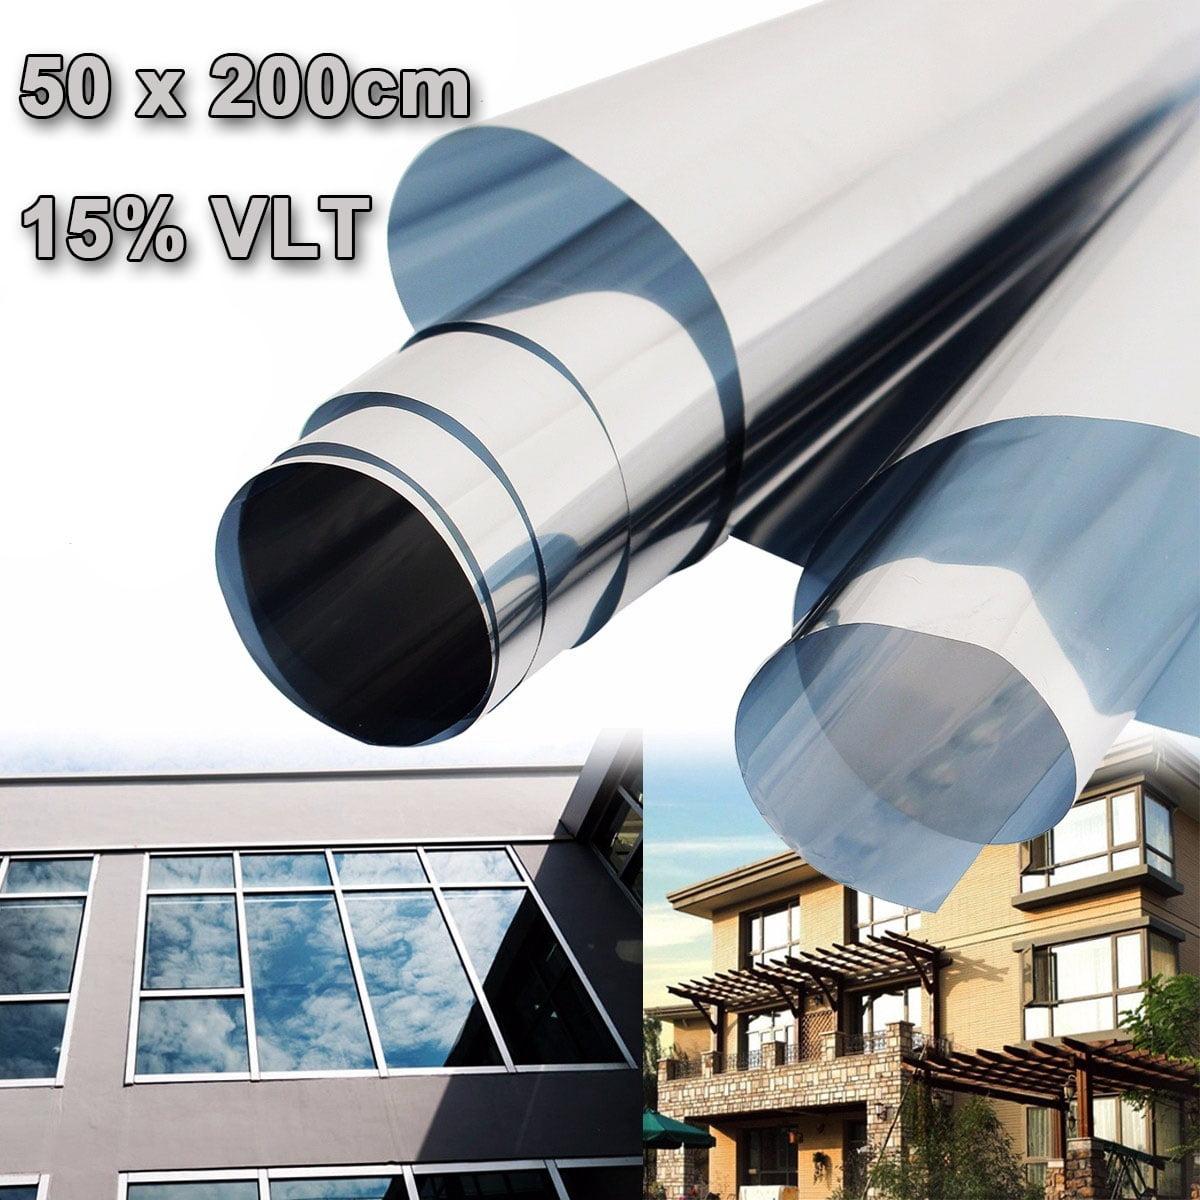 15% UV Solar Reflective Transmittance Insulation Sticker Window Film One Way Type Mirror 50cmx2m Silver